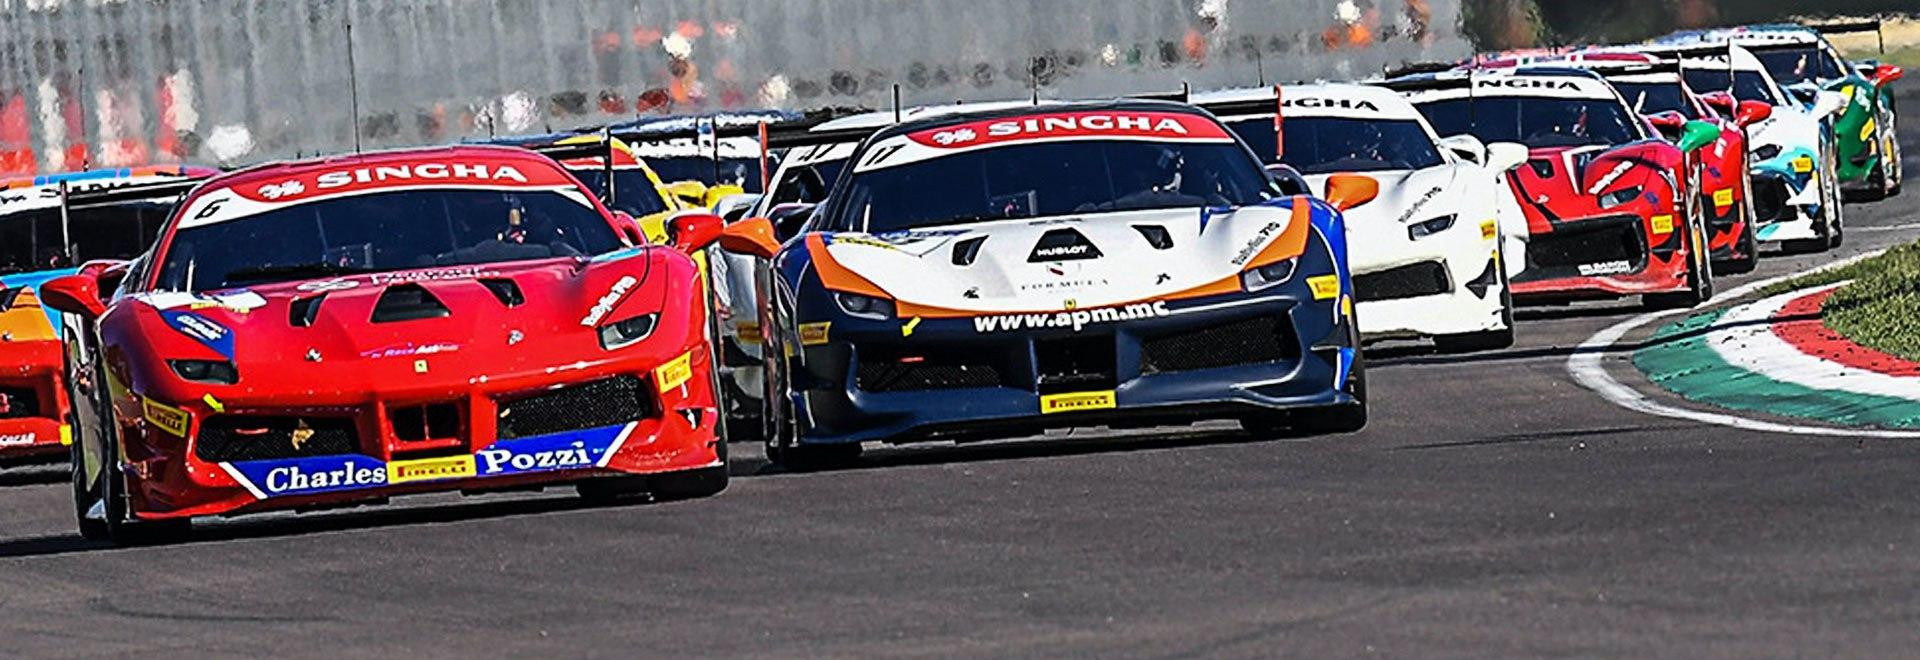 Trofeo Pirelli Portimao. Gara 1